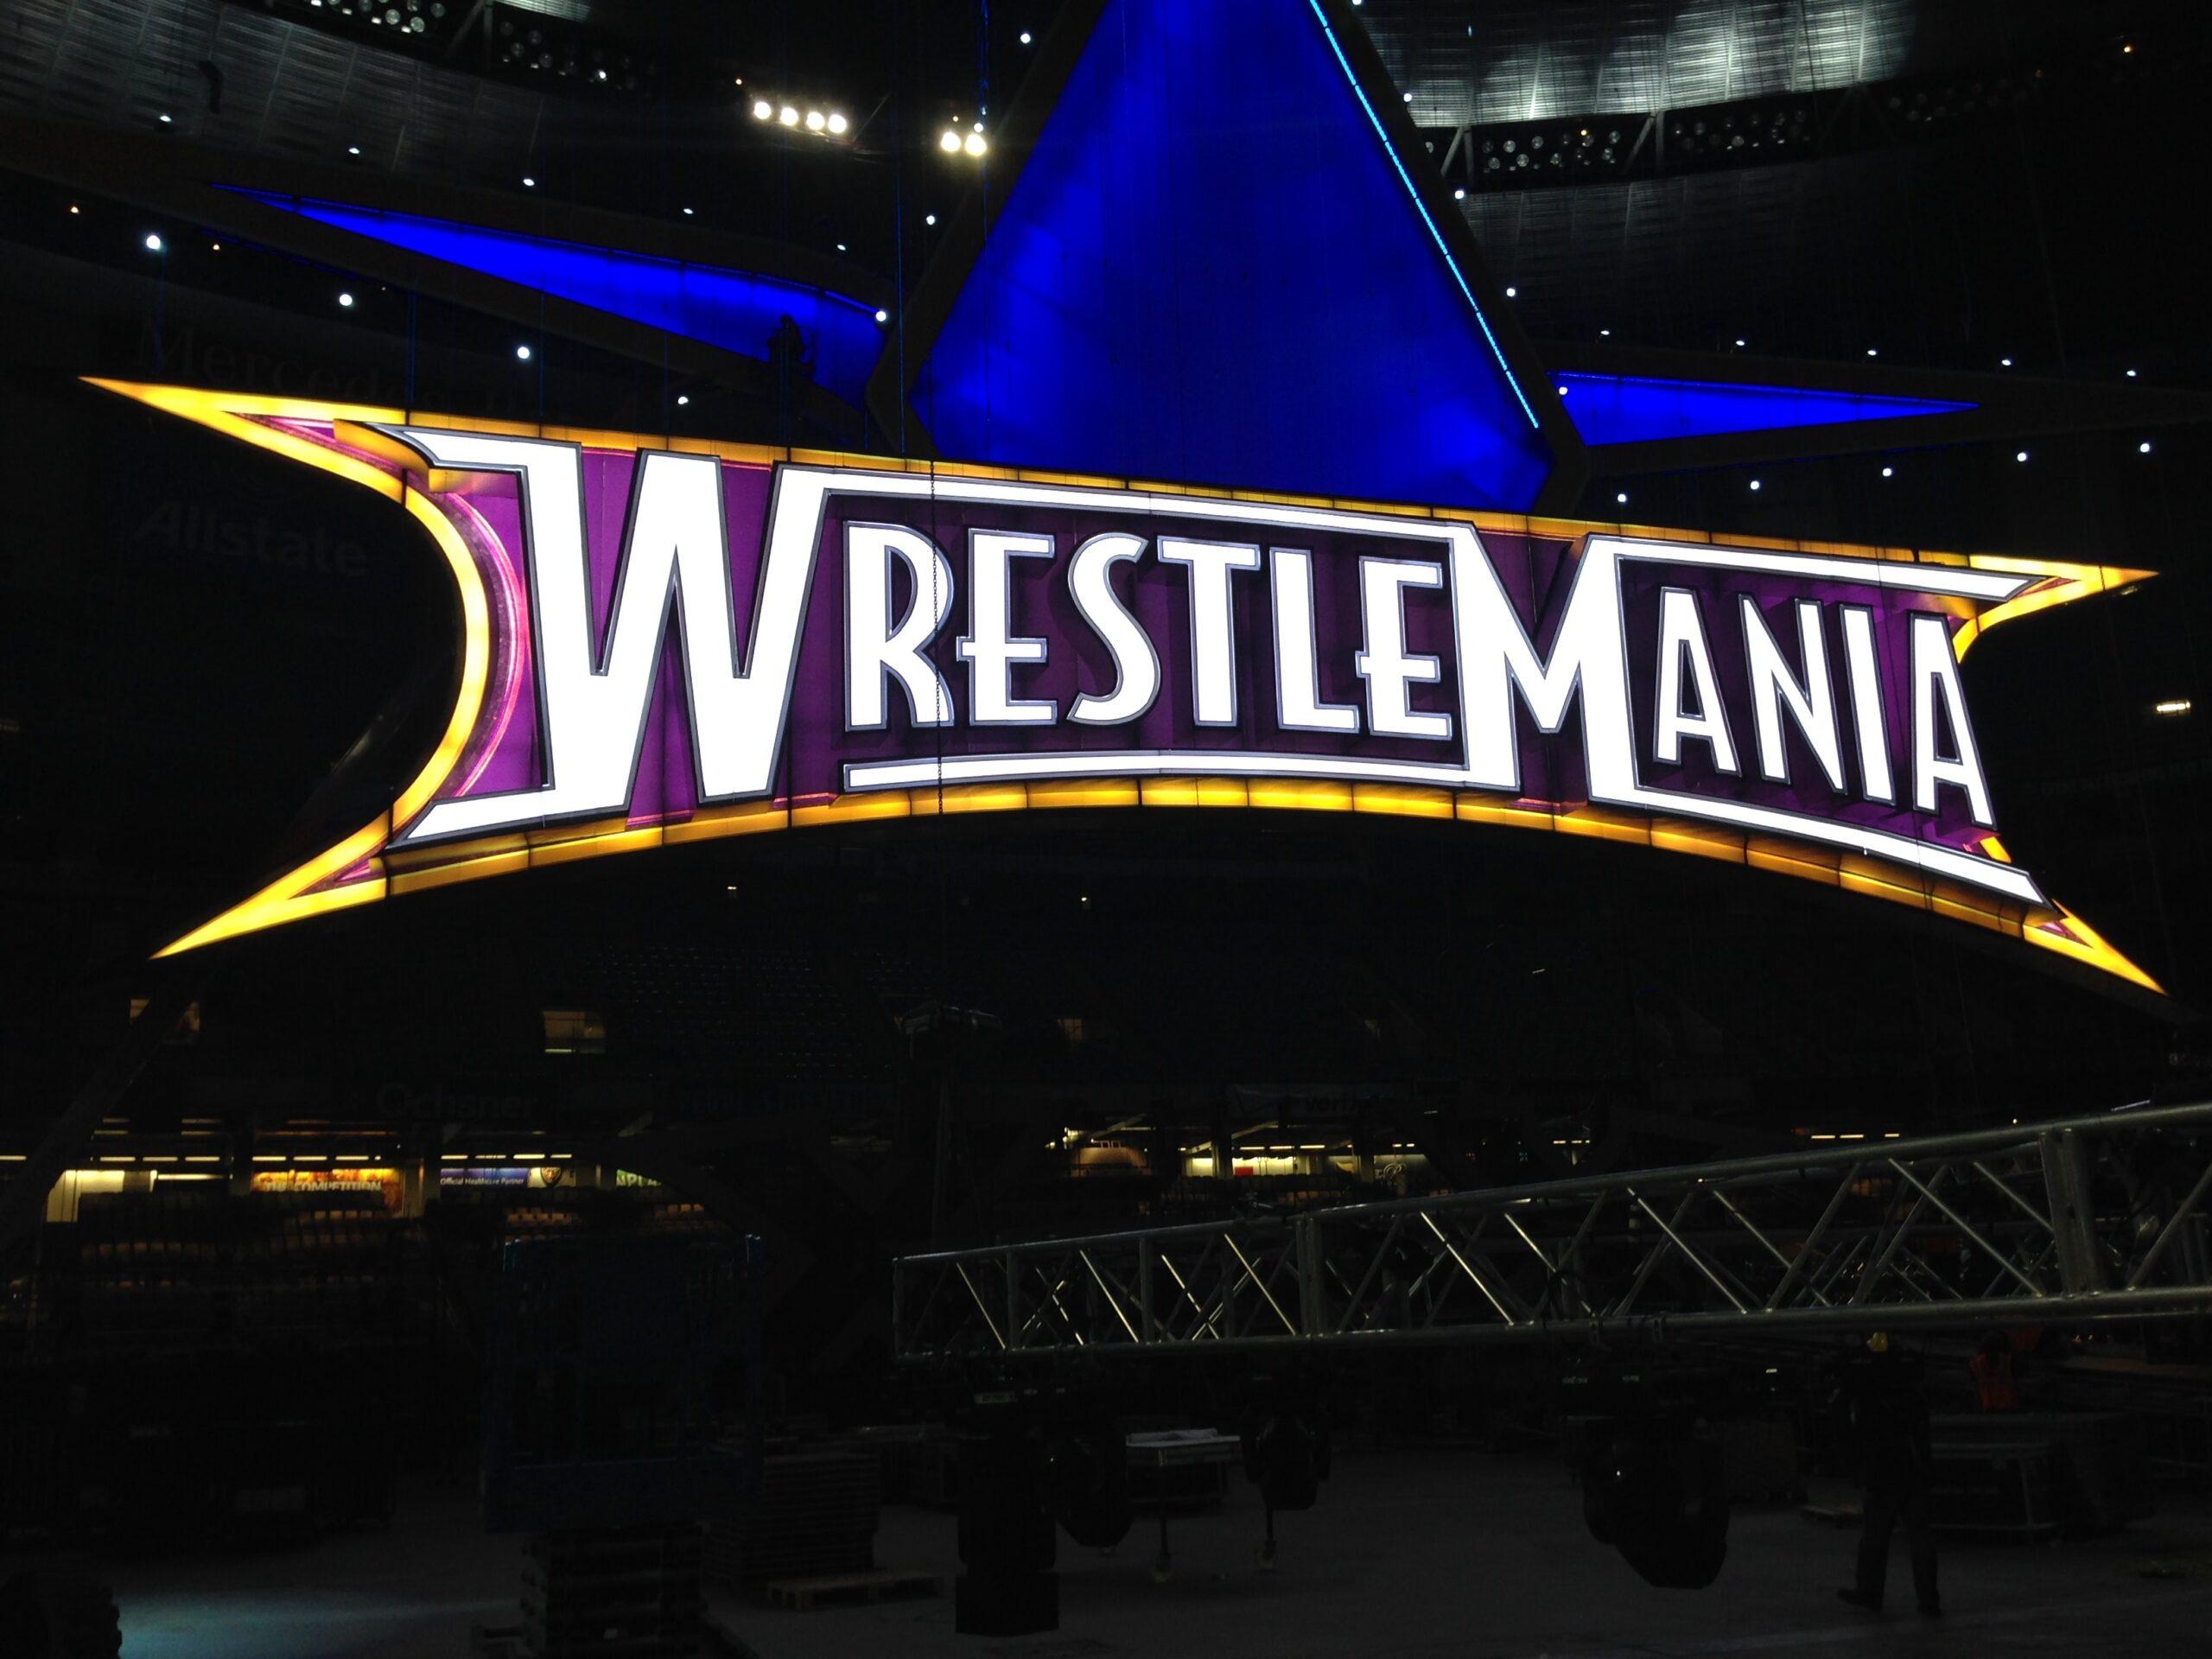 Propmasters Wrestlemania set 4